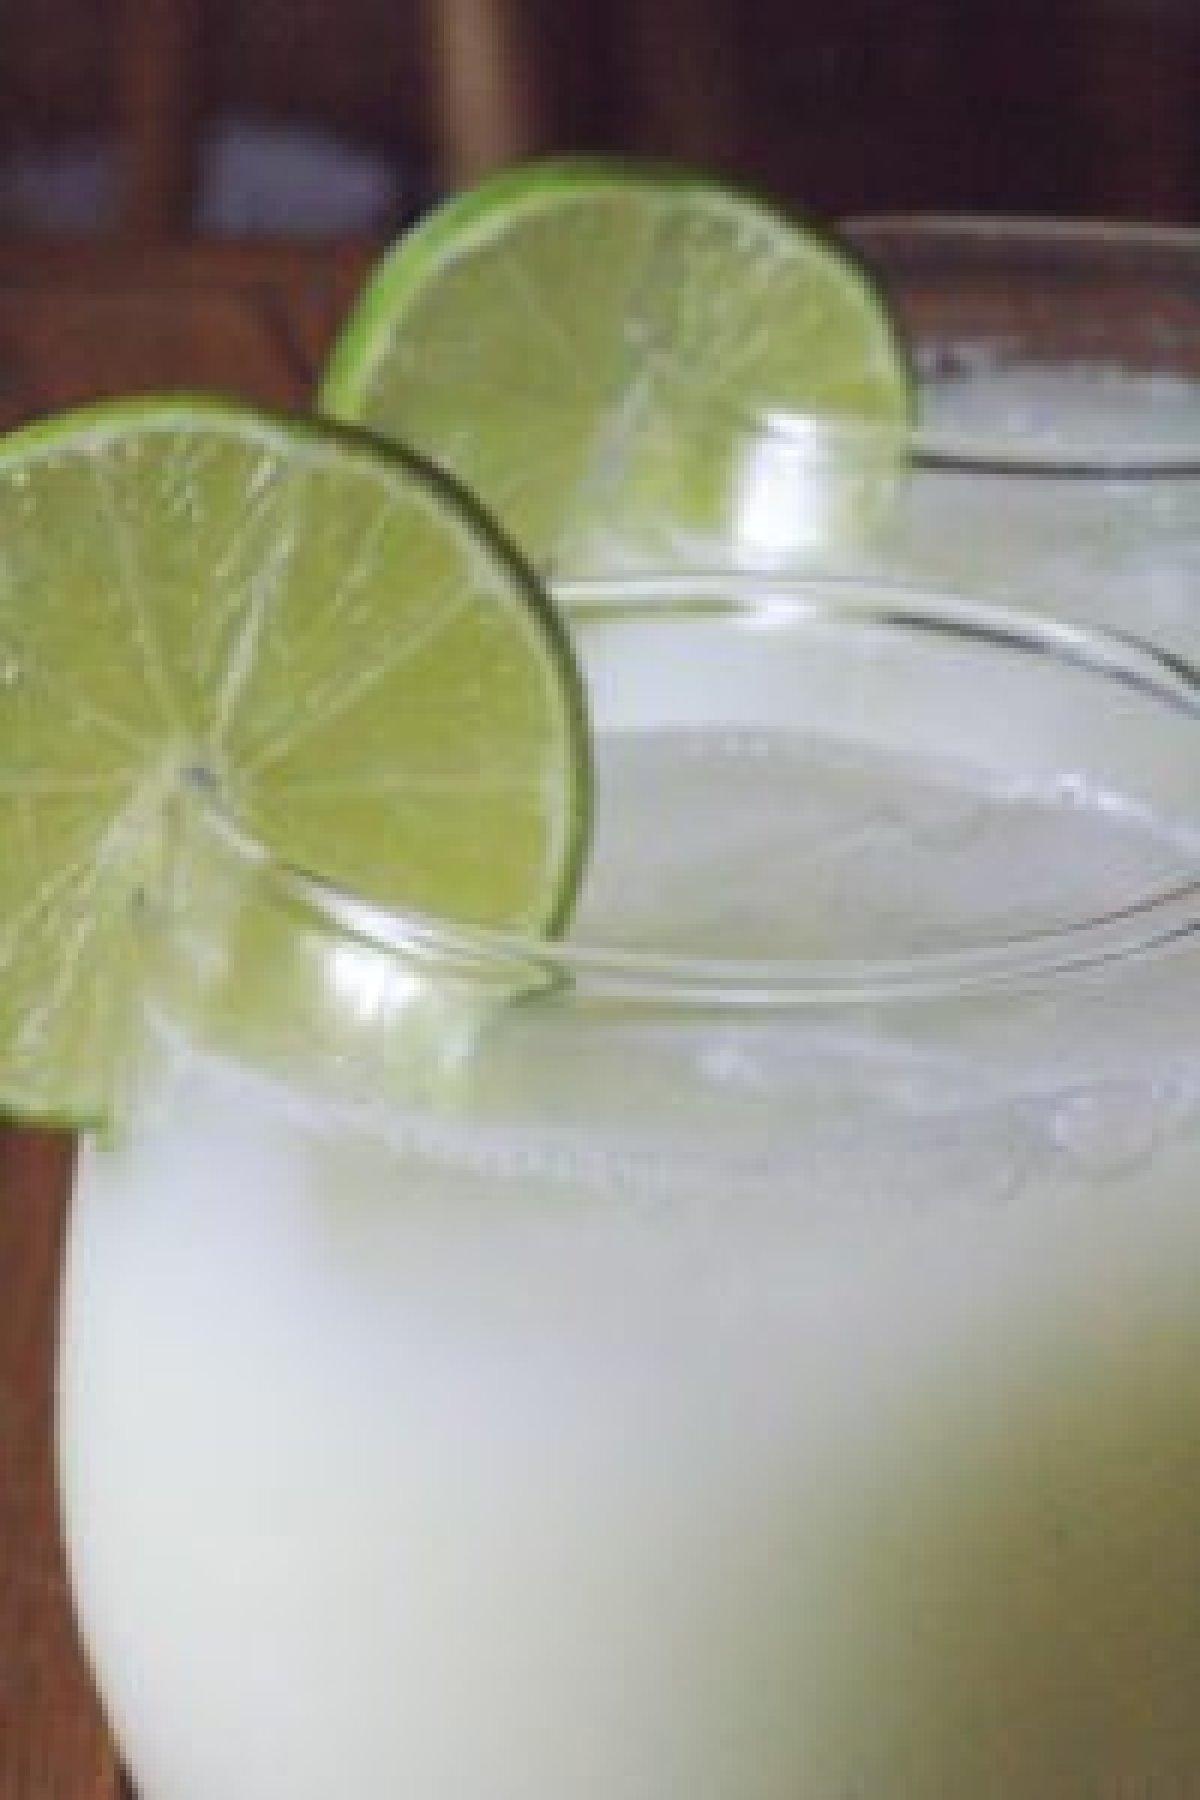 Easy Brazilian Lemonade